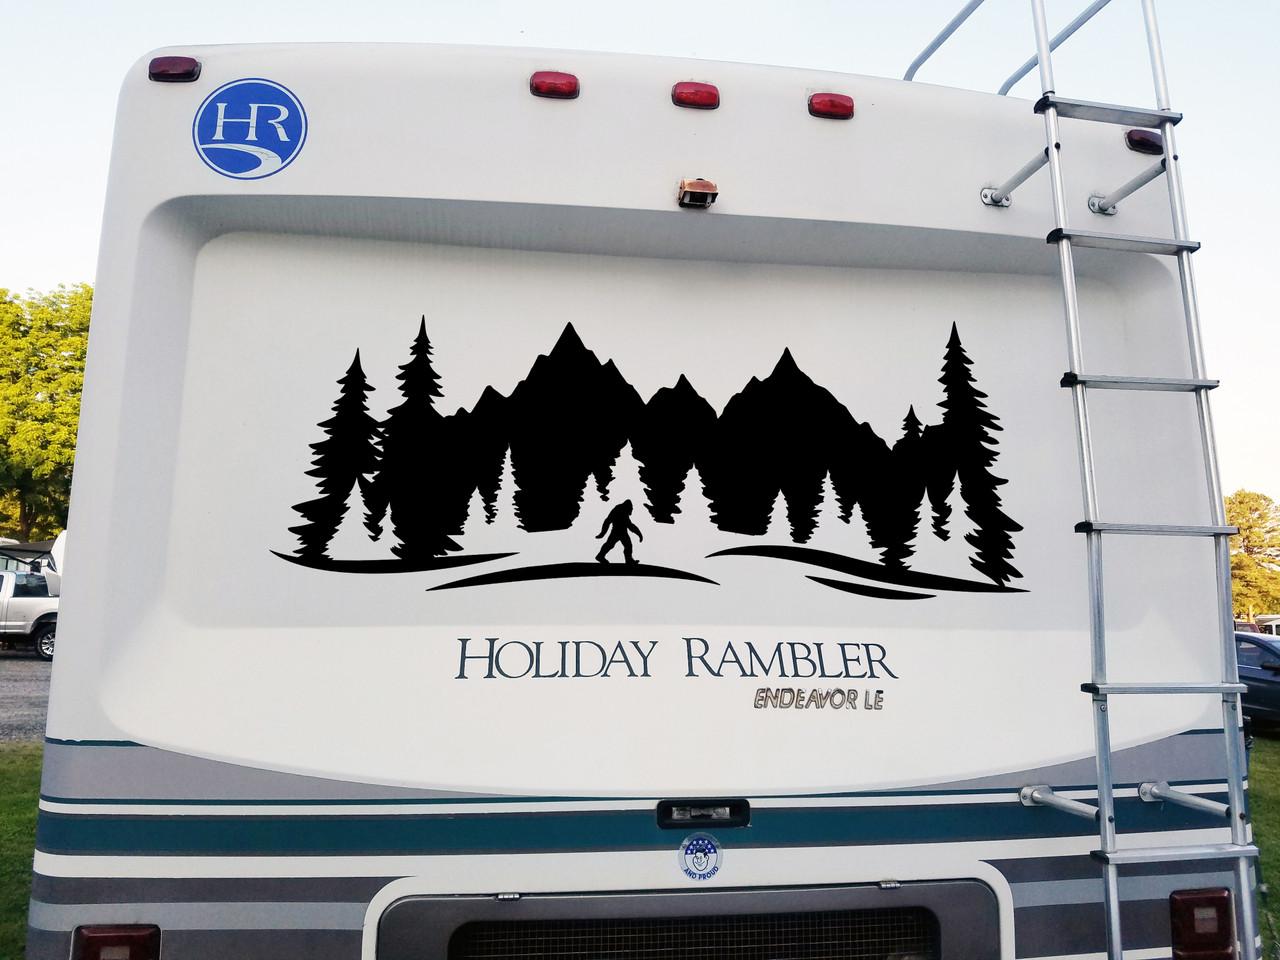 Bigfoot Forest Trees Scene V1 Vinyl Decal - RV Camper Graphics Travel Trailer - Die Cut Sticker